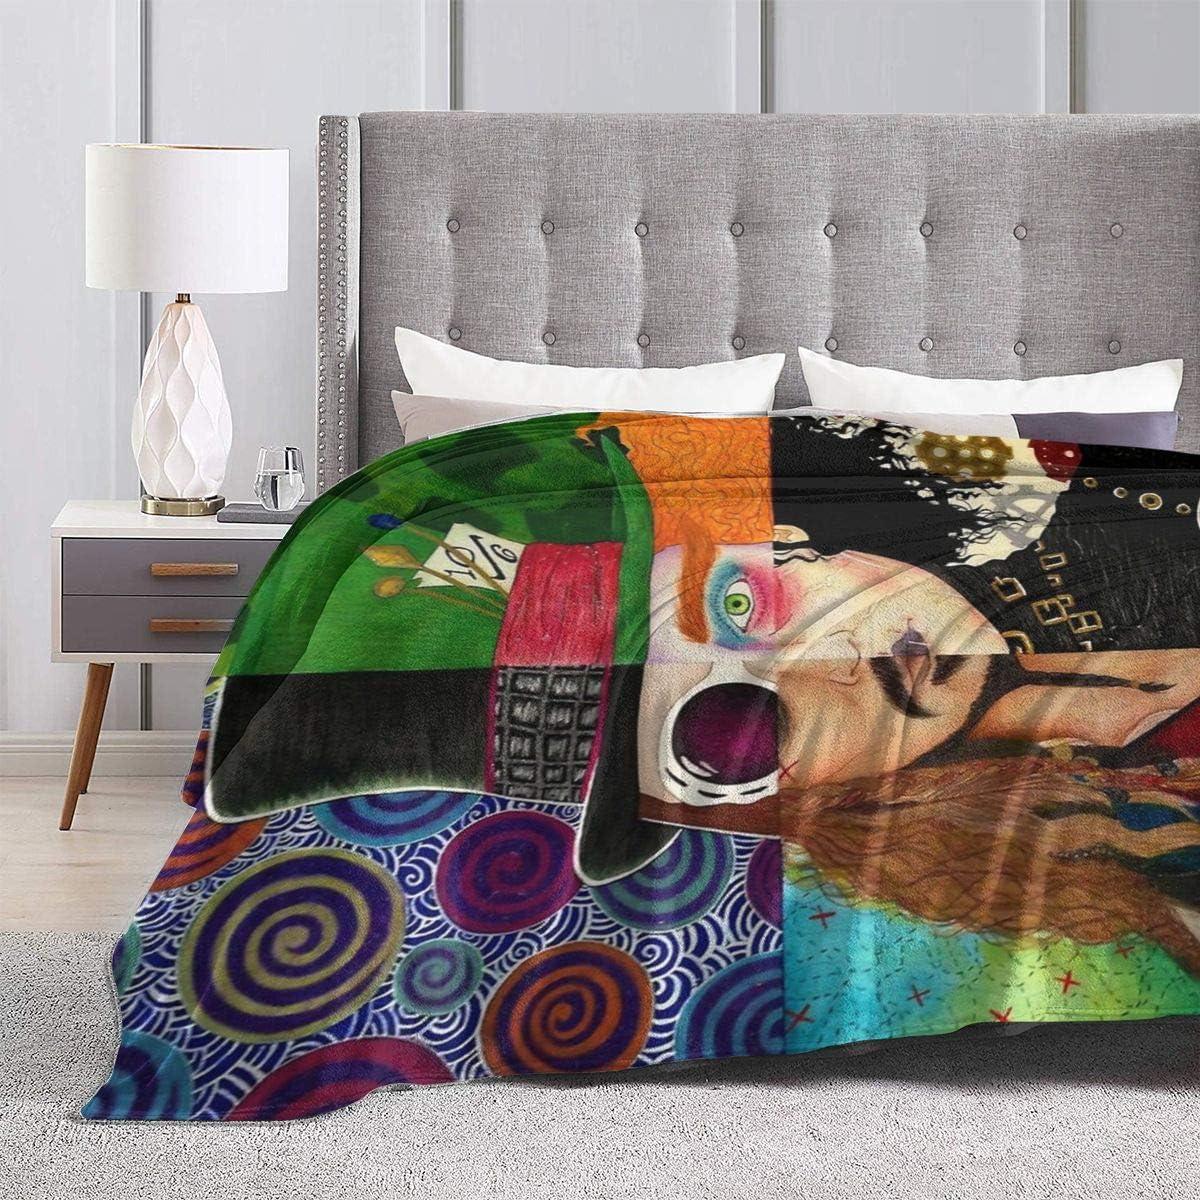 Throw Blanket Johnny Depp Super All Season Lightweight Soft Warm Luxury goods 2021 autumn and winter new